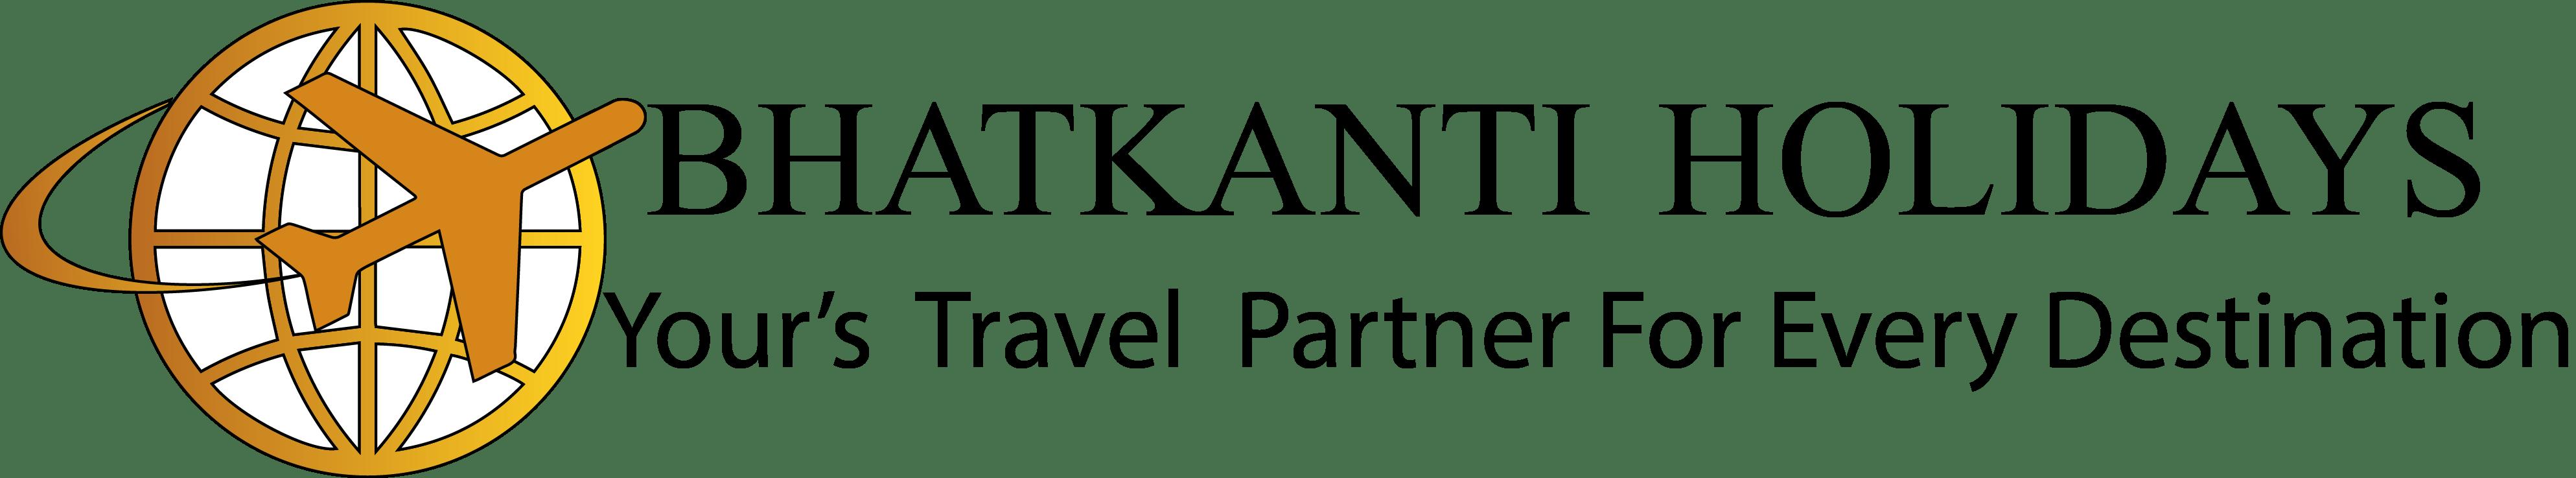 Bhatkanti Holidays Logo